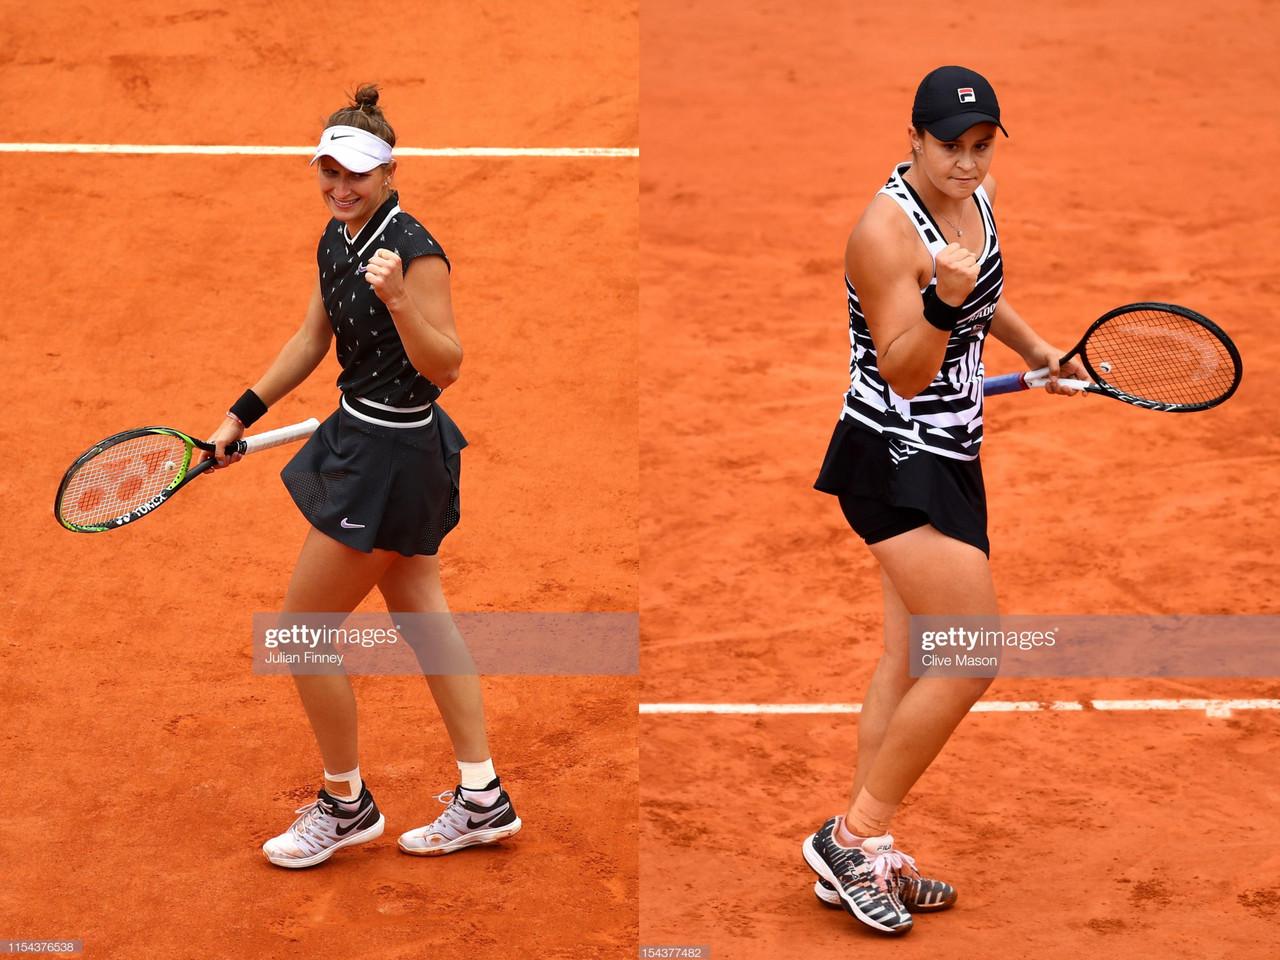 French Open final preview: Ashleigh Barty vs Marketa Vondrousova